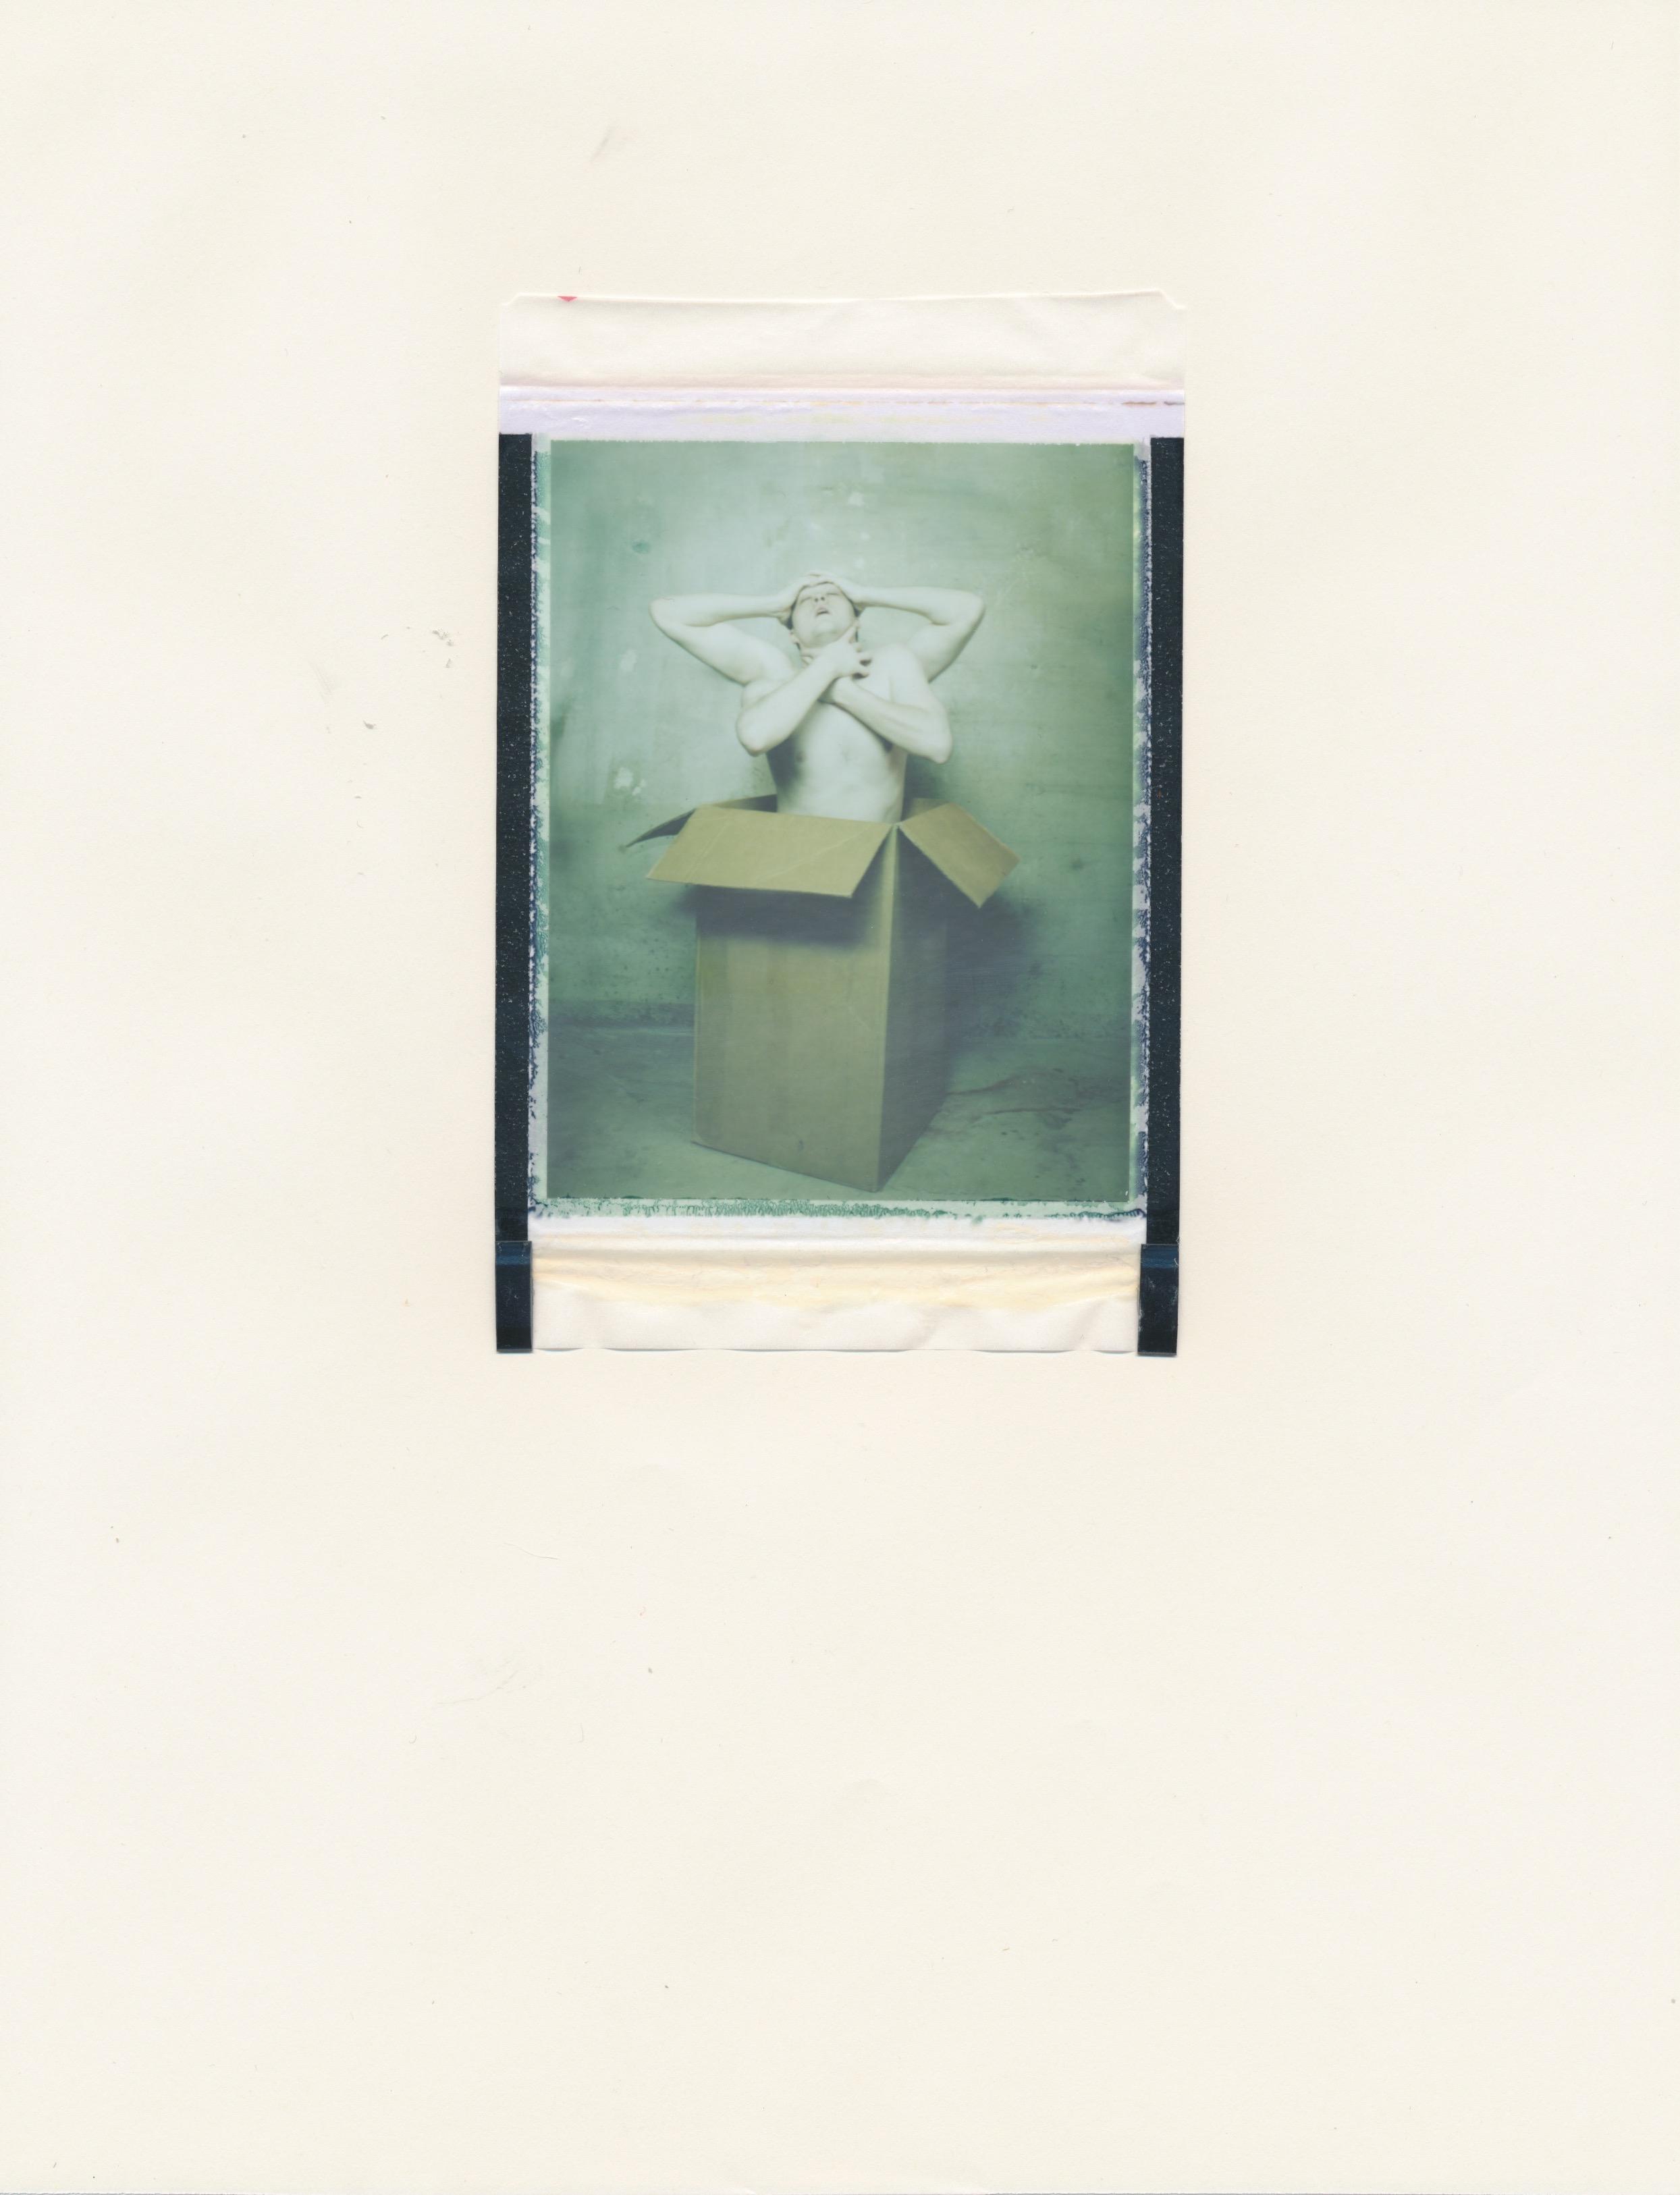 Human Obscura #10(Figure in Box 3)   2015  Diffusion Transfer Print on Paper  8.5x11